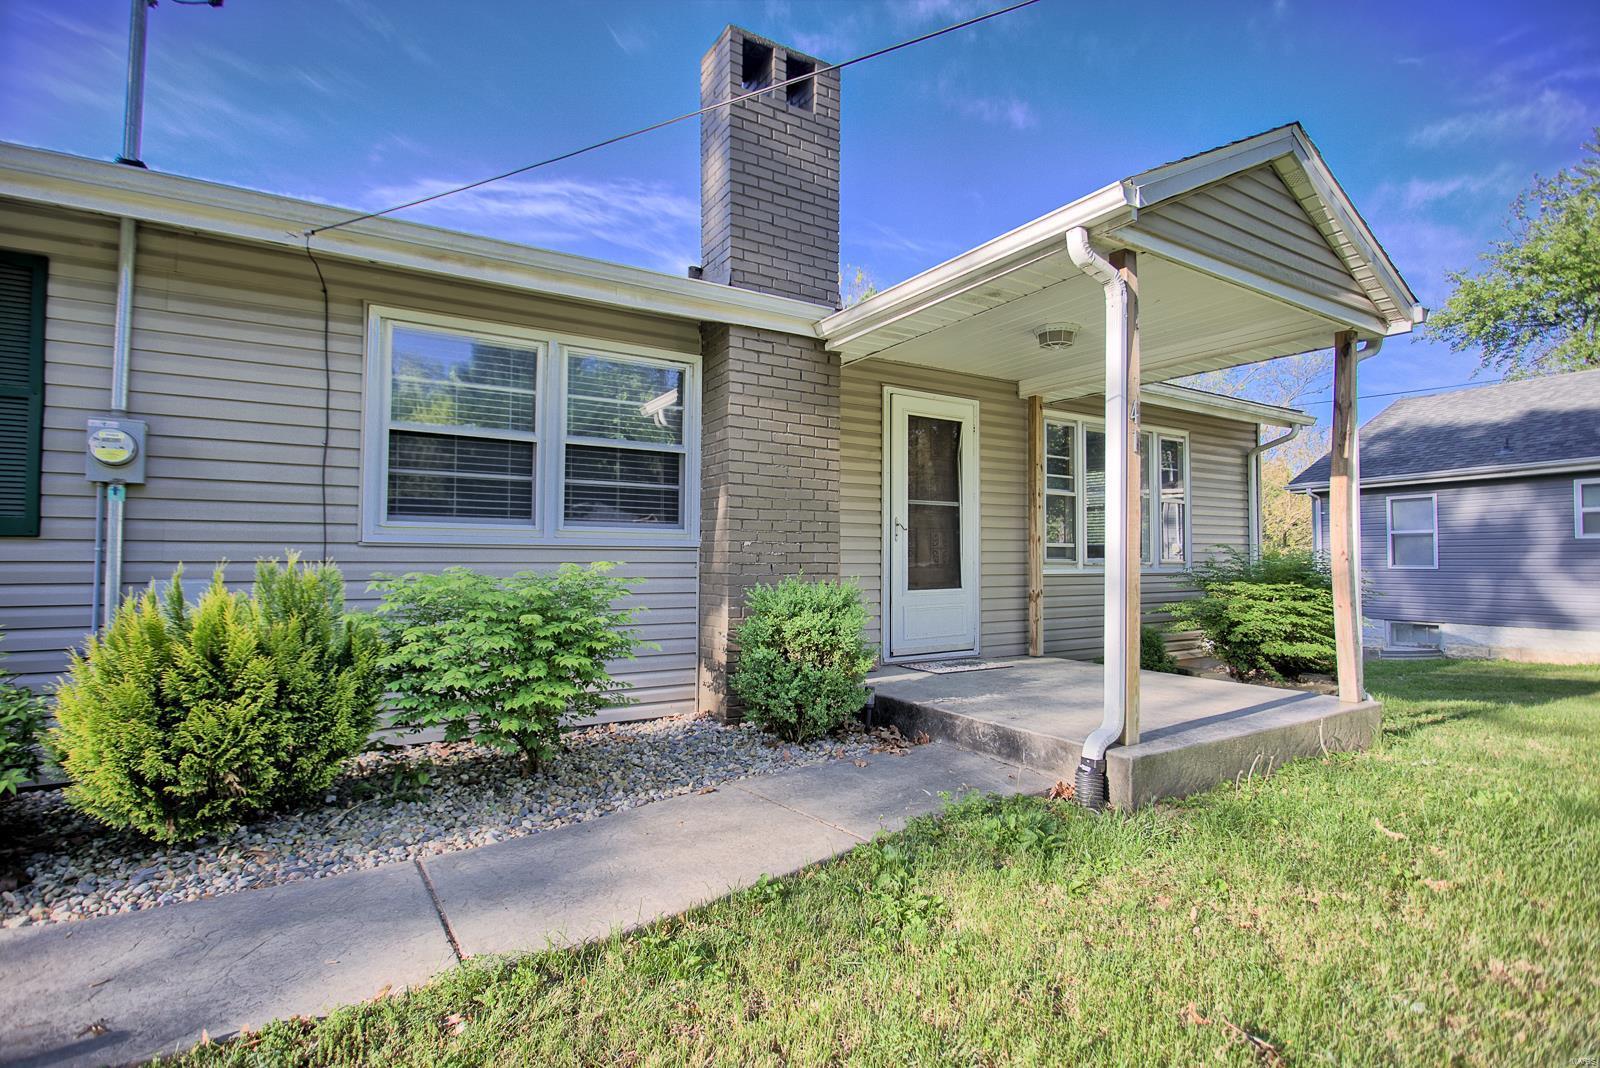 41 Edgewood Lane Property Photo - Caseyville, IL real estate listing